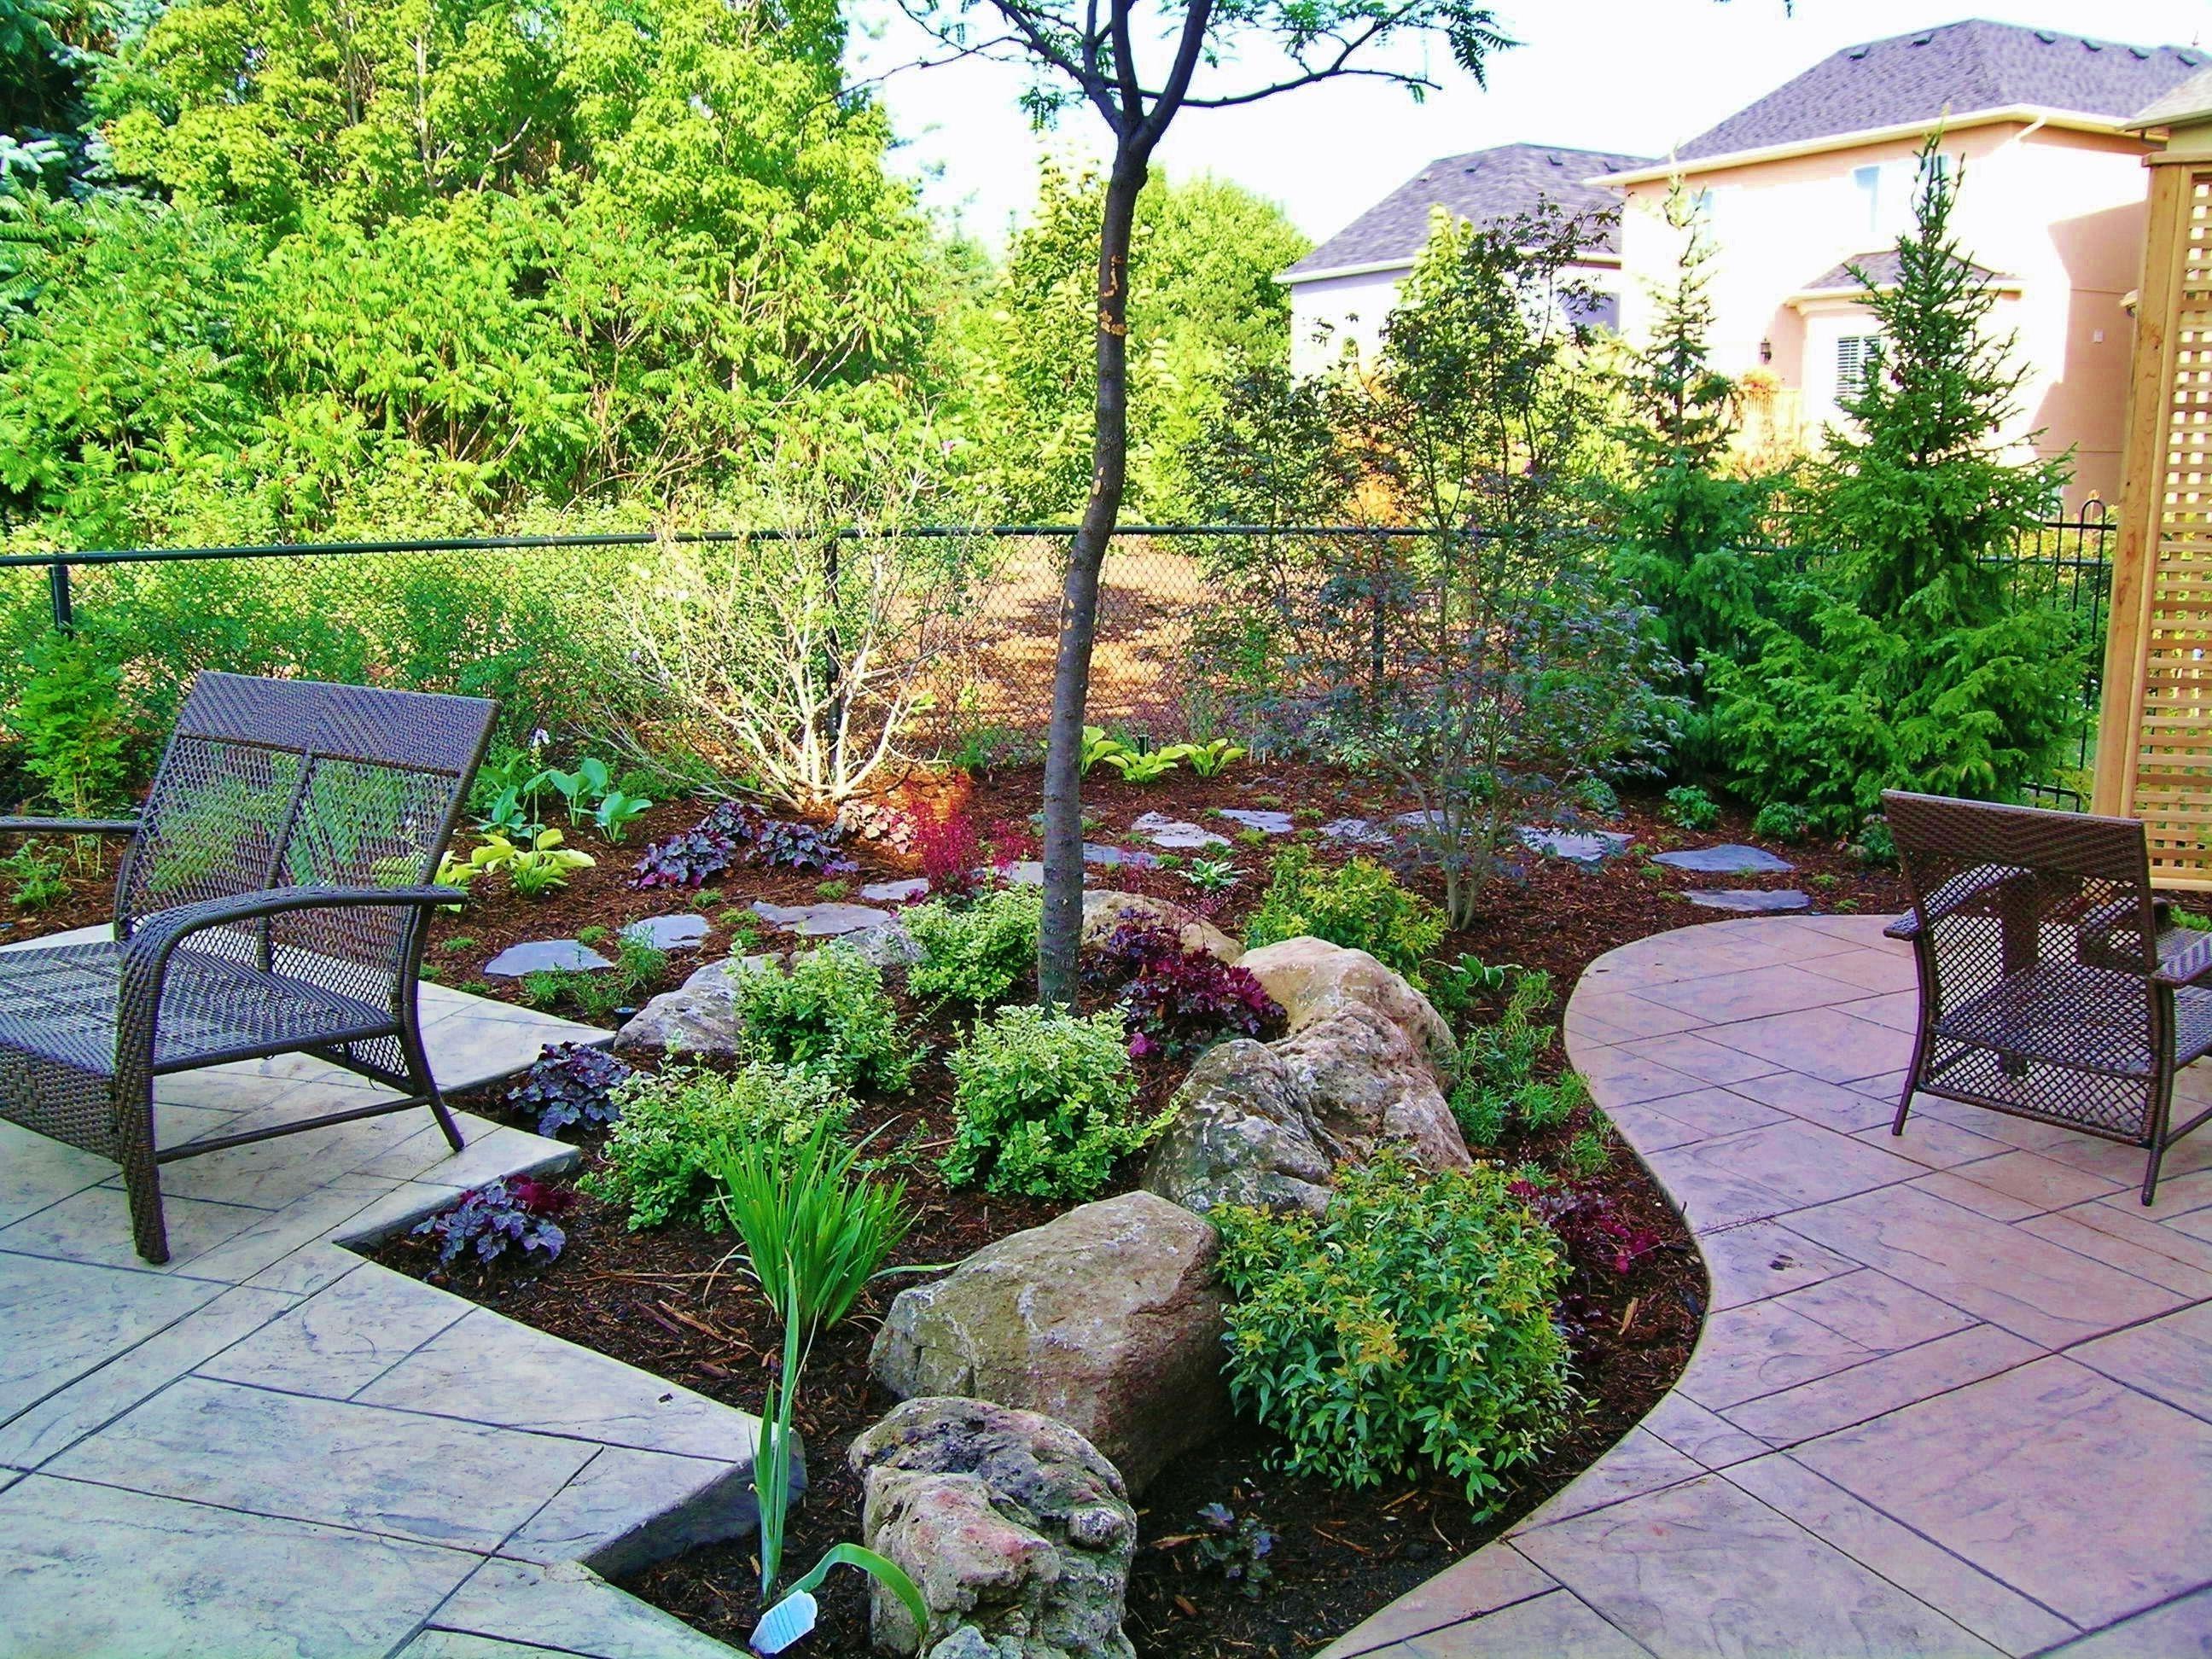 Formidable Backyard Ideas No Grass Backyard Landscaping Plans